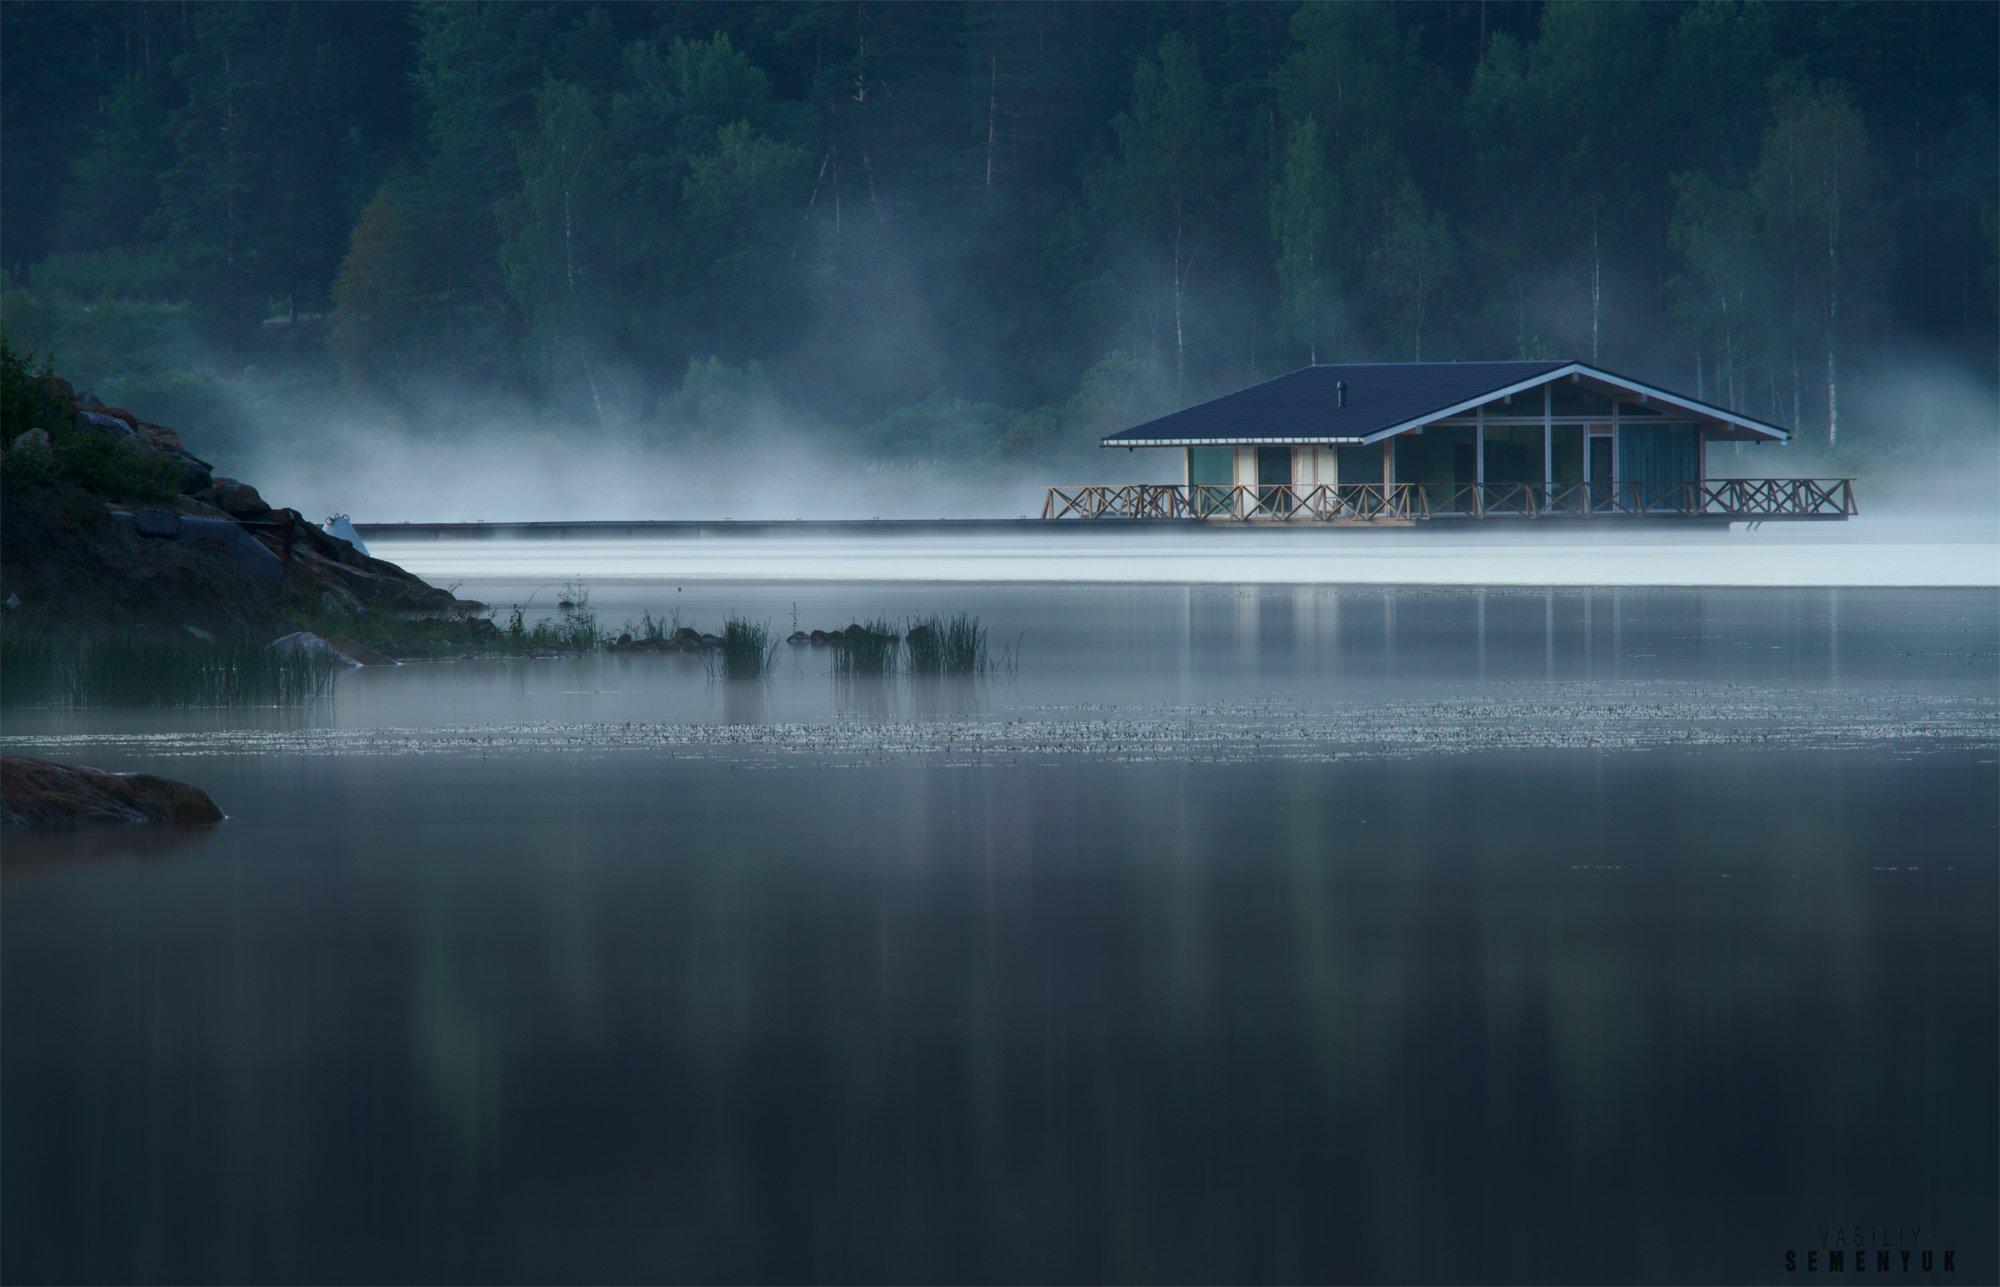 Ладога, шхеры, озеро, туман, пейзаж, одинокий дом, Семенюк Василий